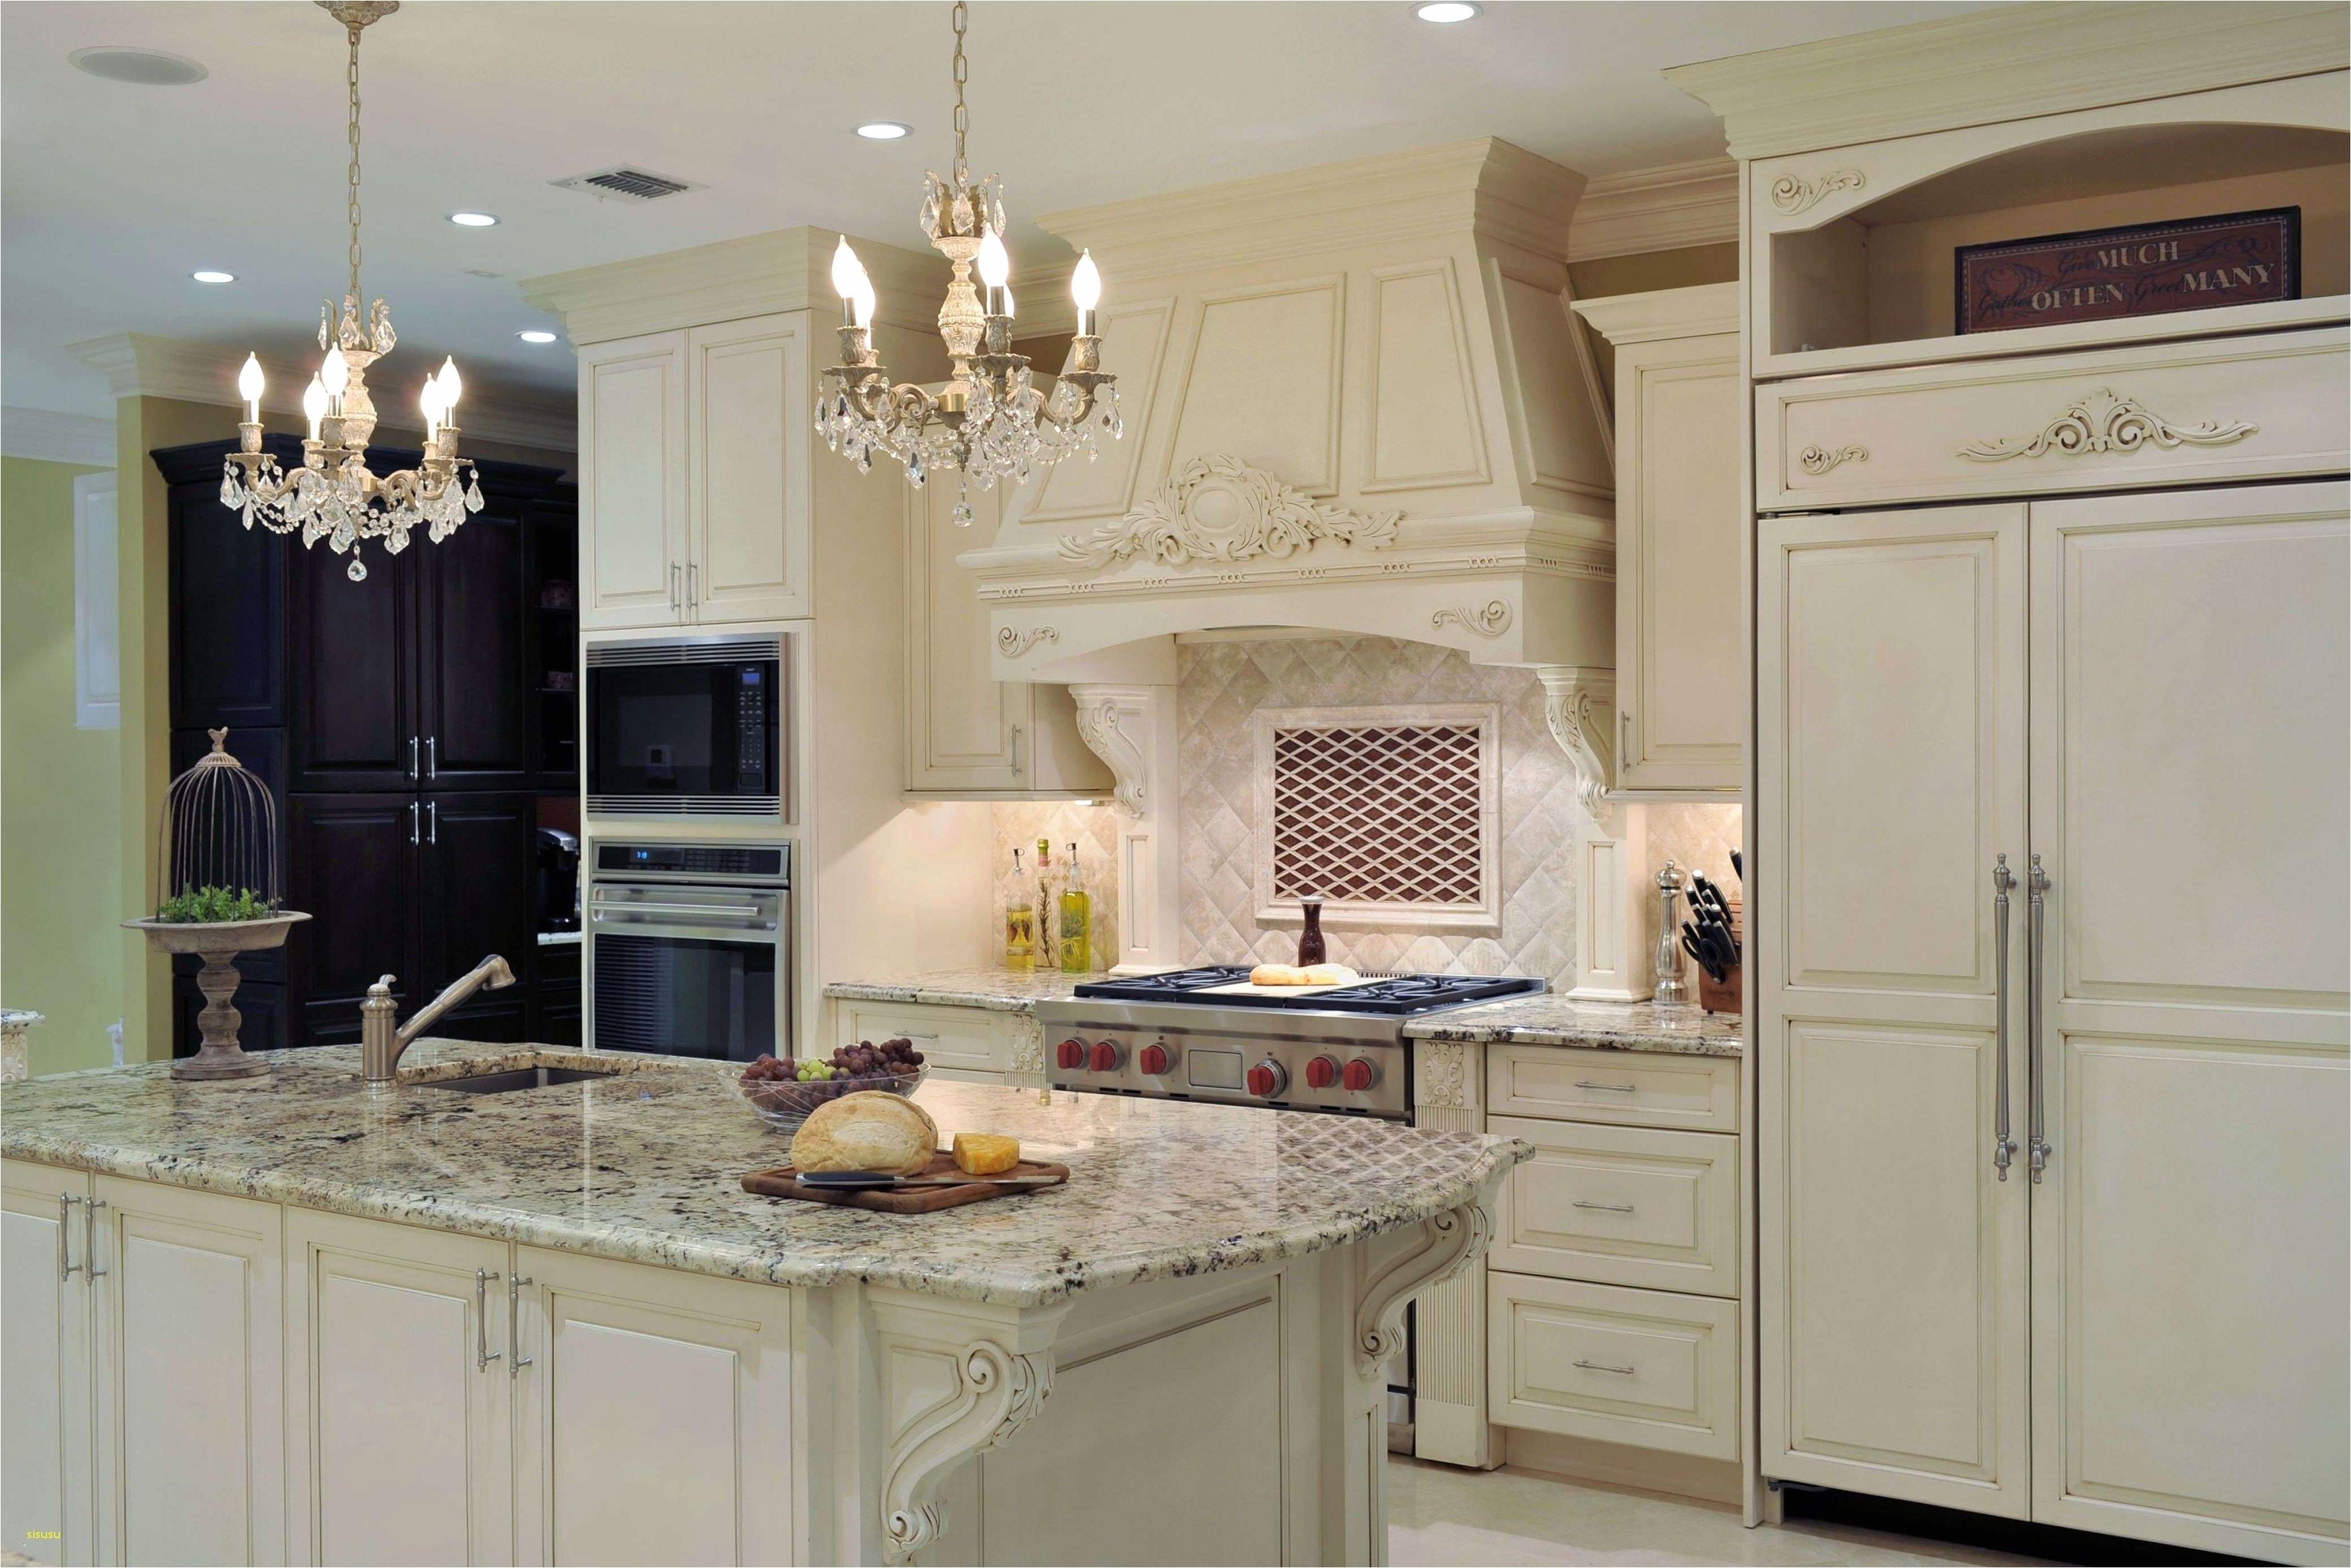 kitchen cabinet 0d bright lights elegant lowes lighting chandeliers